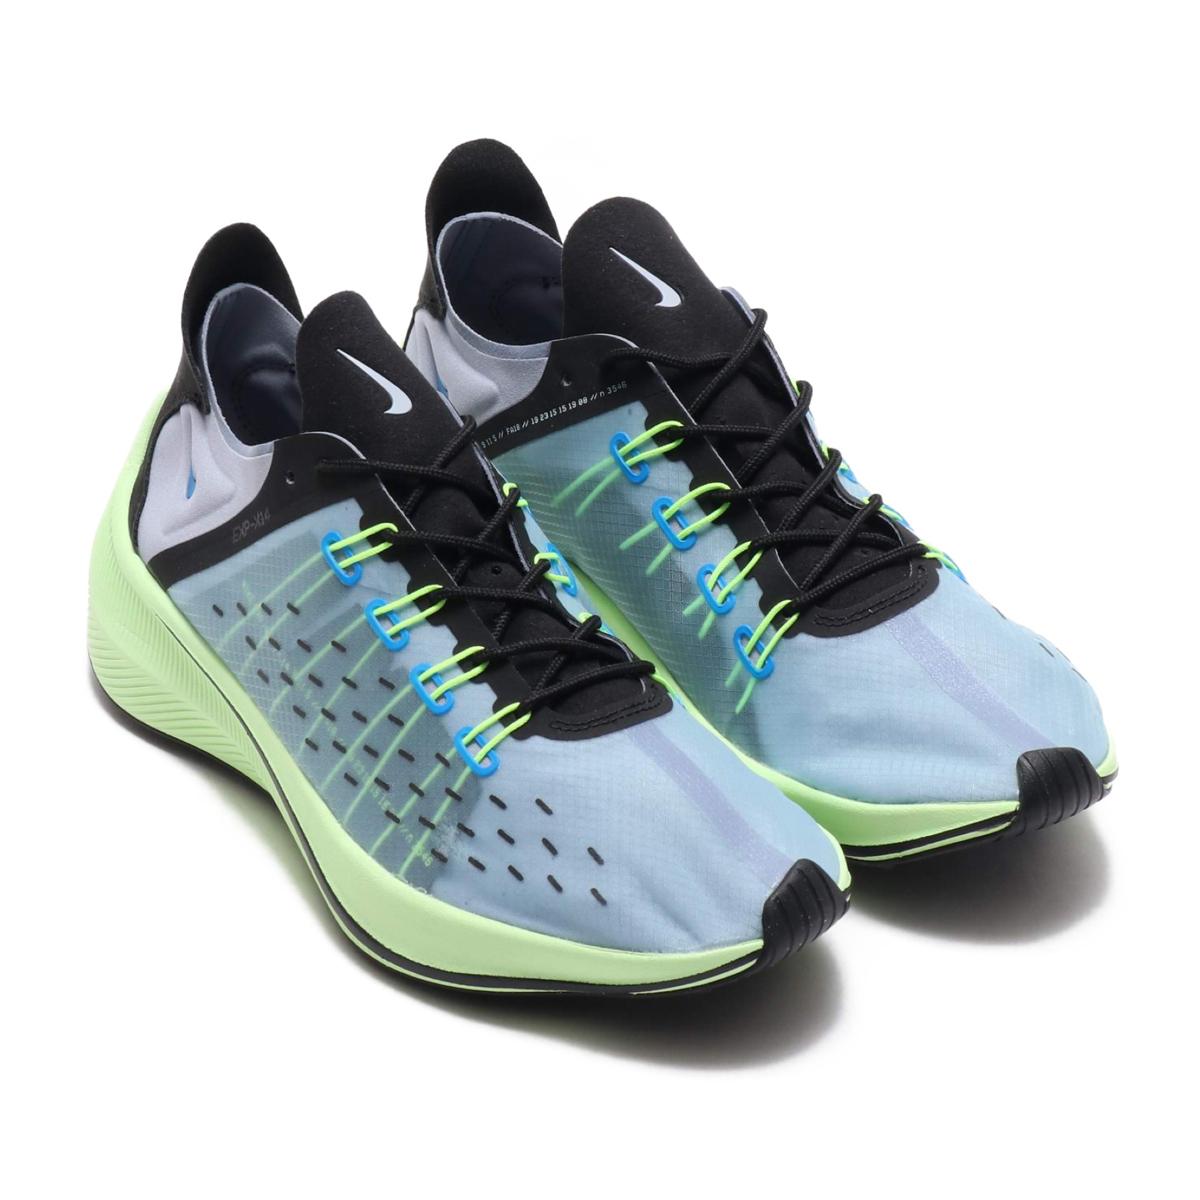 6aebb34f9783 NIKE EXP-X14 (Nike EXP-X14) PHOTO BLUE GLACIER GREY-BLACK-VOLT 18FA-S